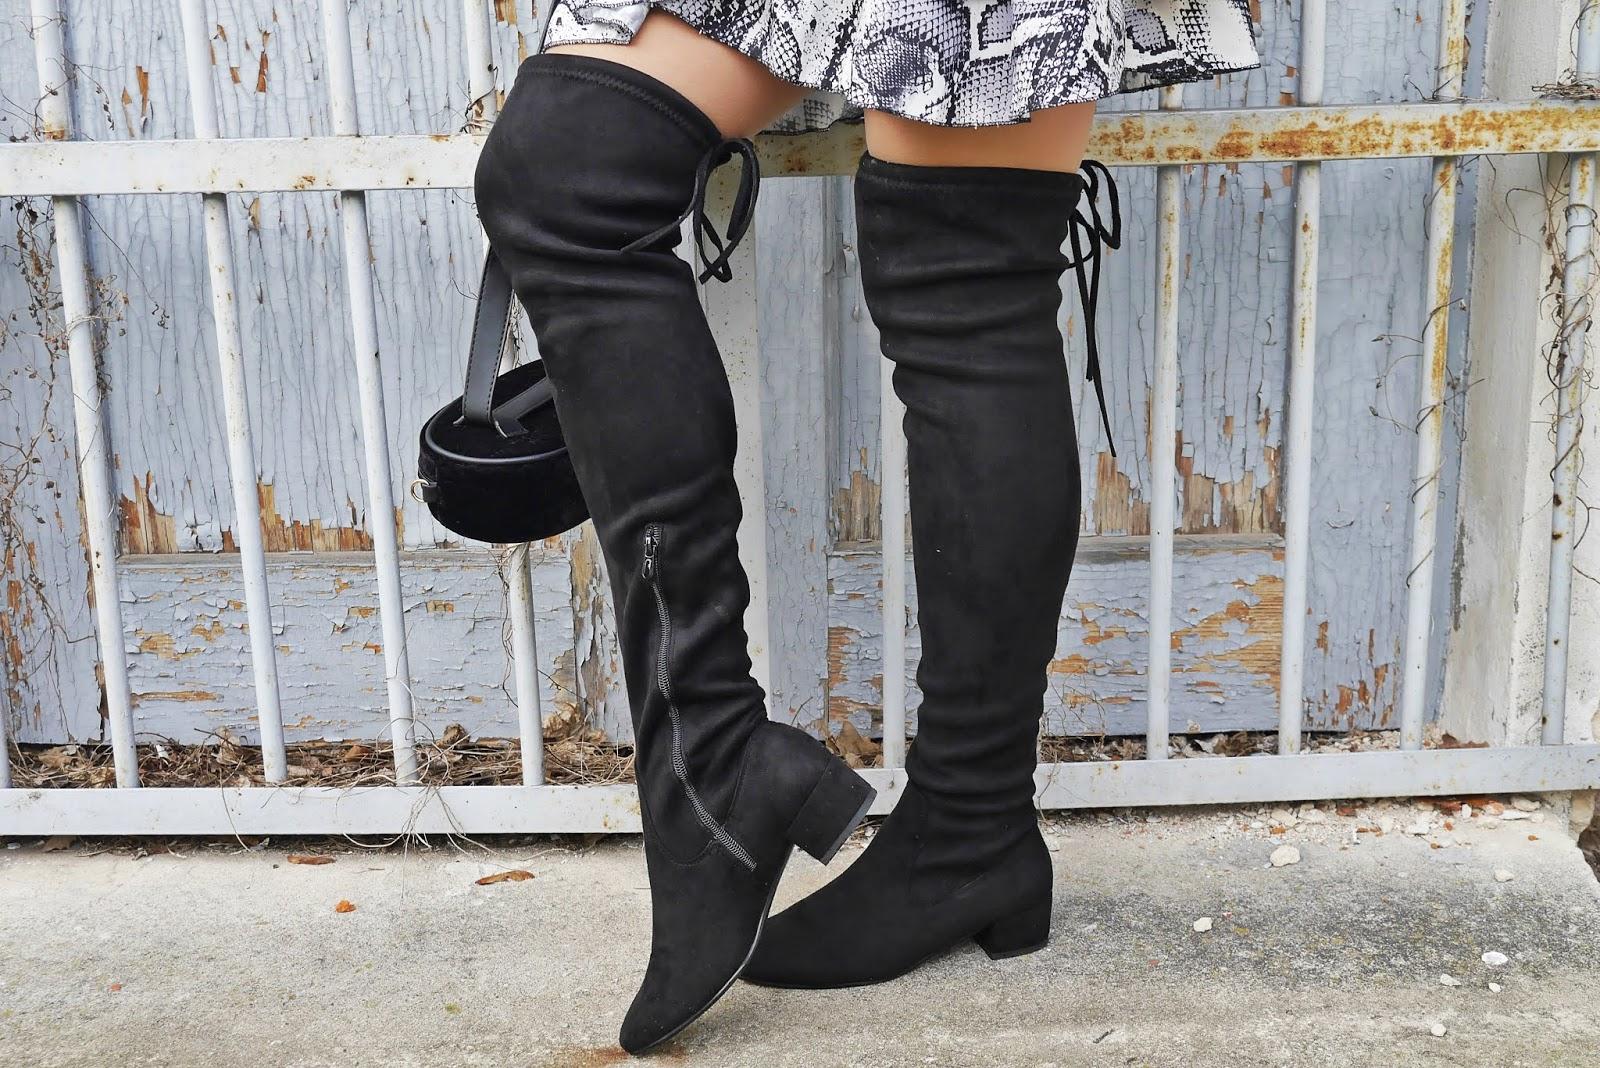 czarne kozaki za kolano renee torebka nerka karyn blog modowy